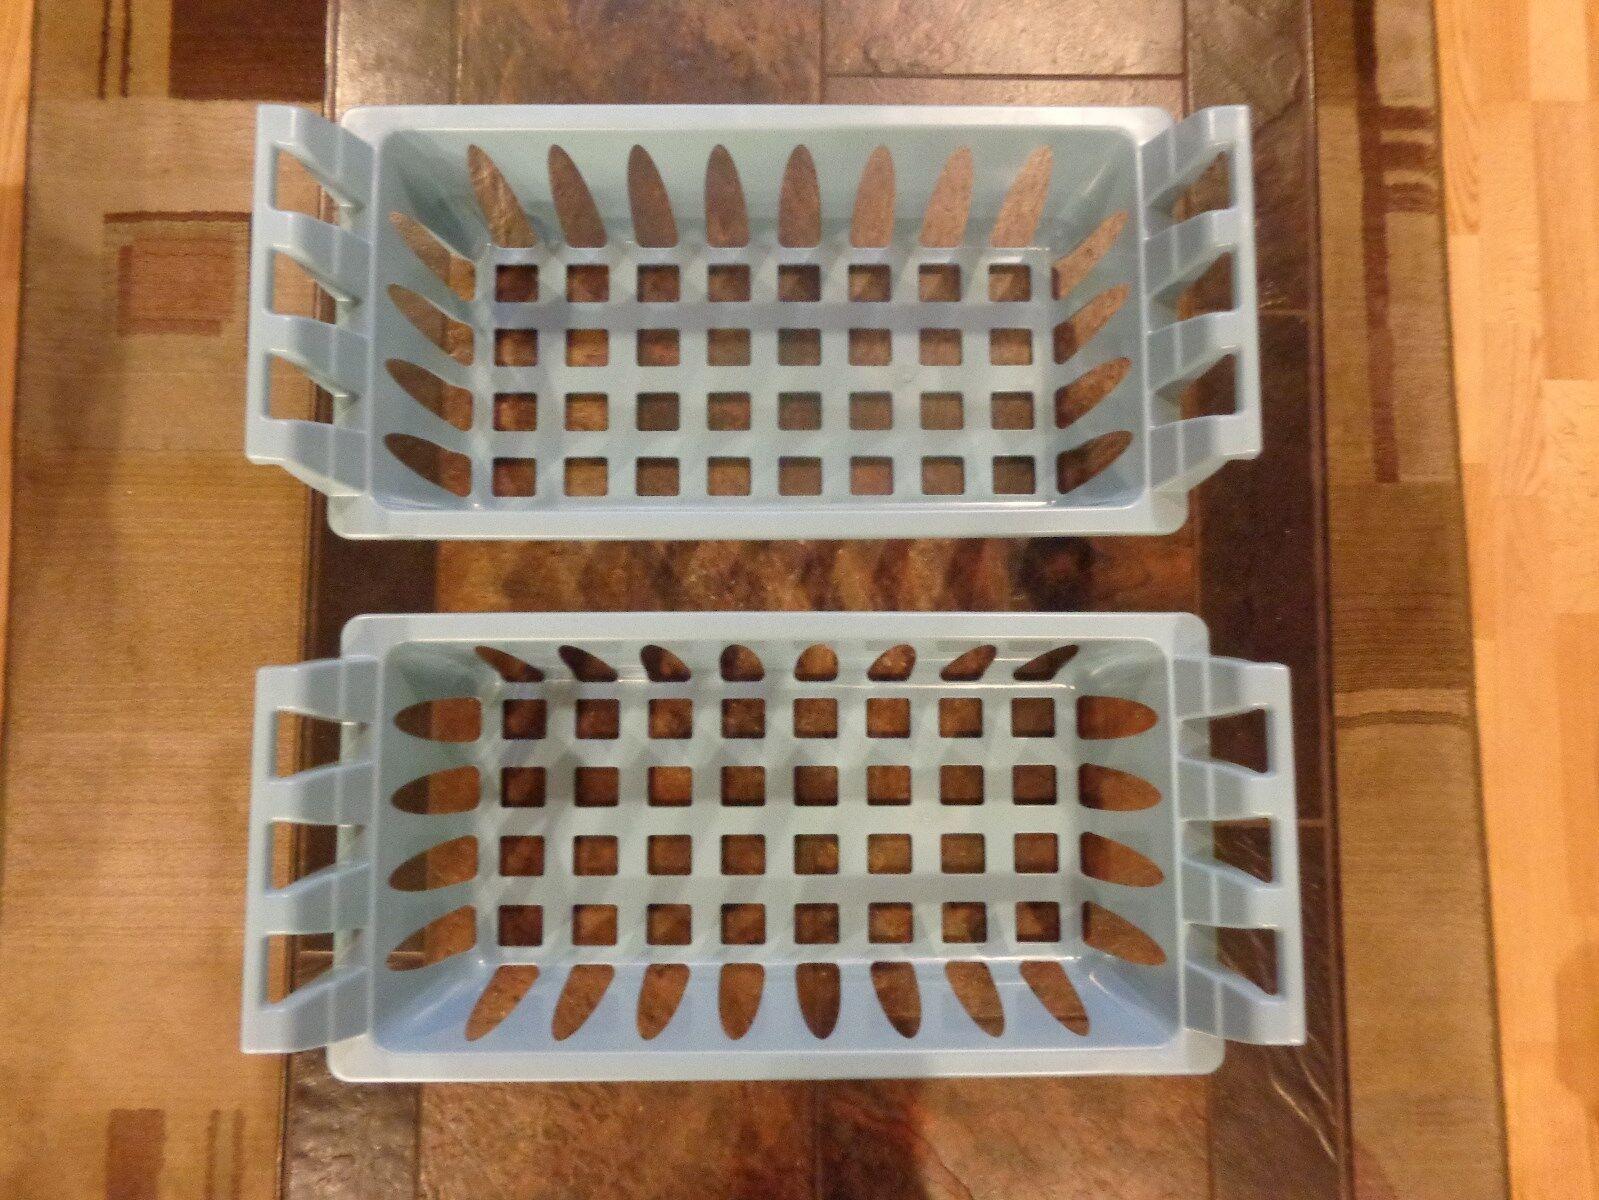 TWO  Genuine Frigidaire Freezer Upper Baskets NEW